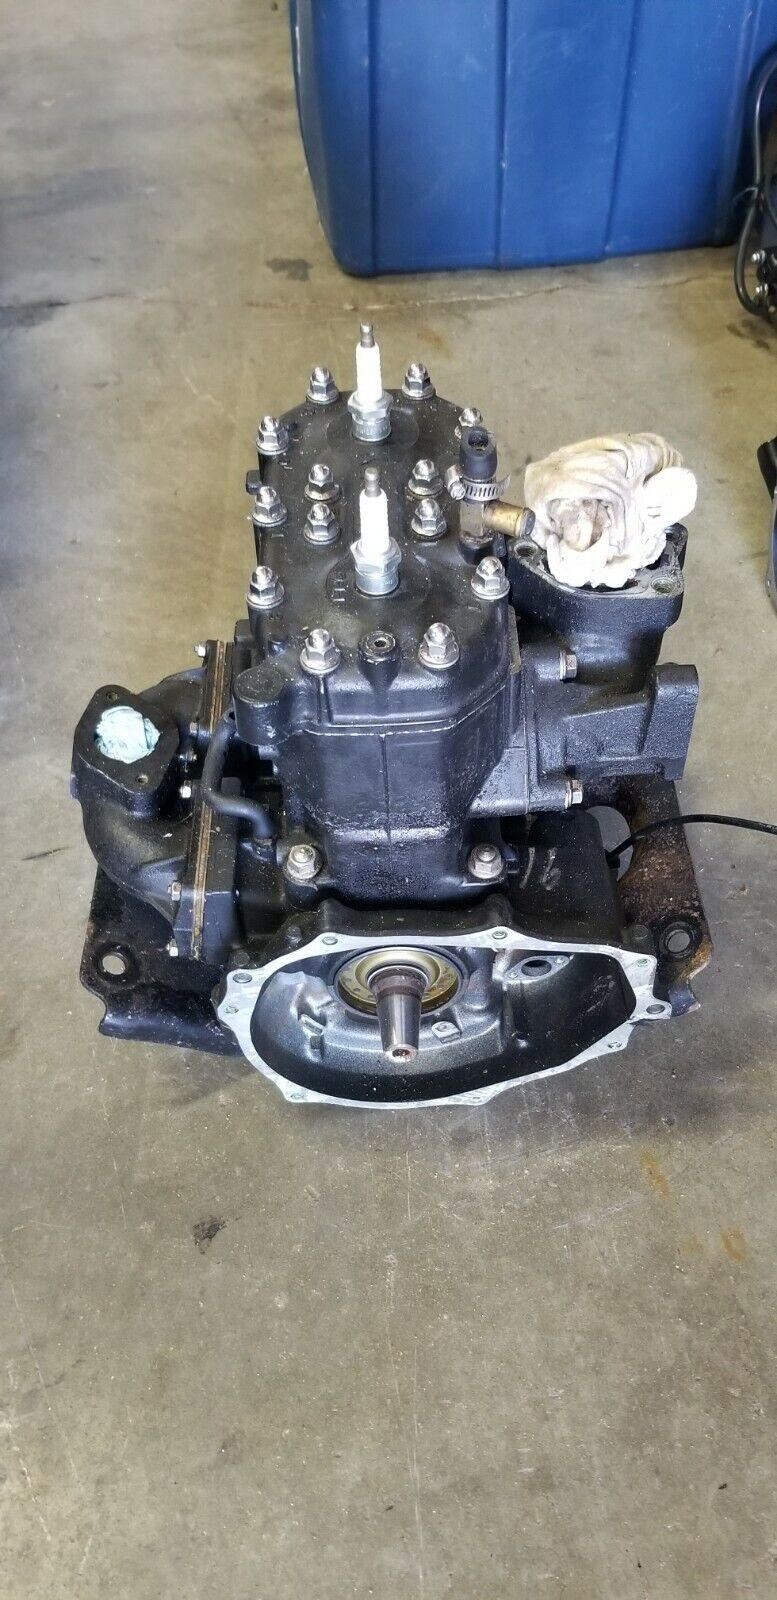 86-94 KAWASAKI 650 Motor engine 650sx X2 SC 650 TS650 TS Jug Jugs Cylinders sx